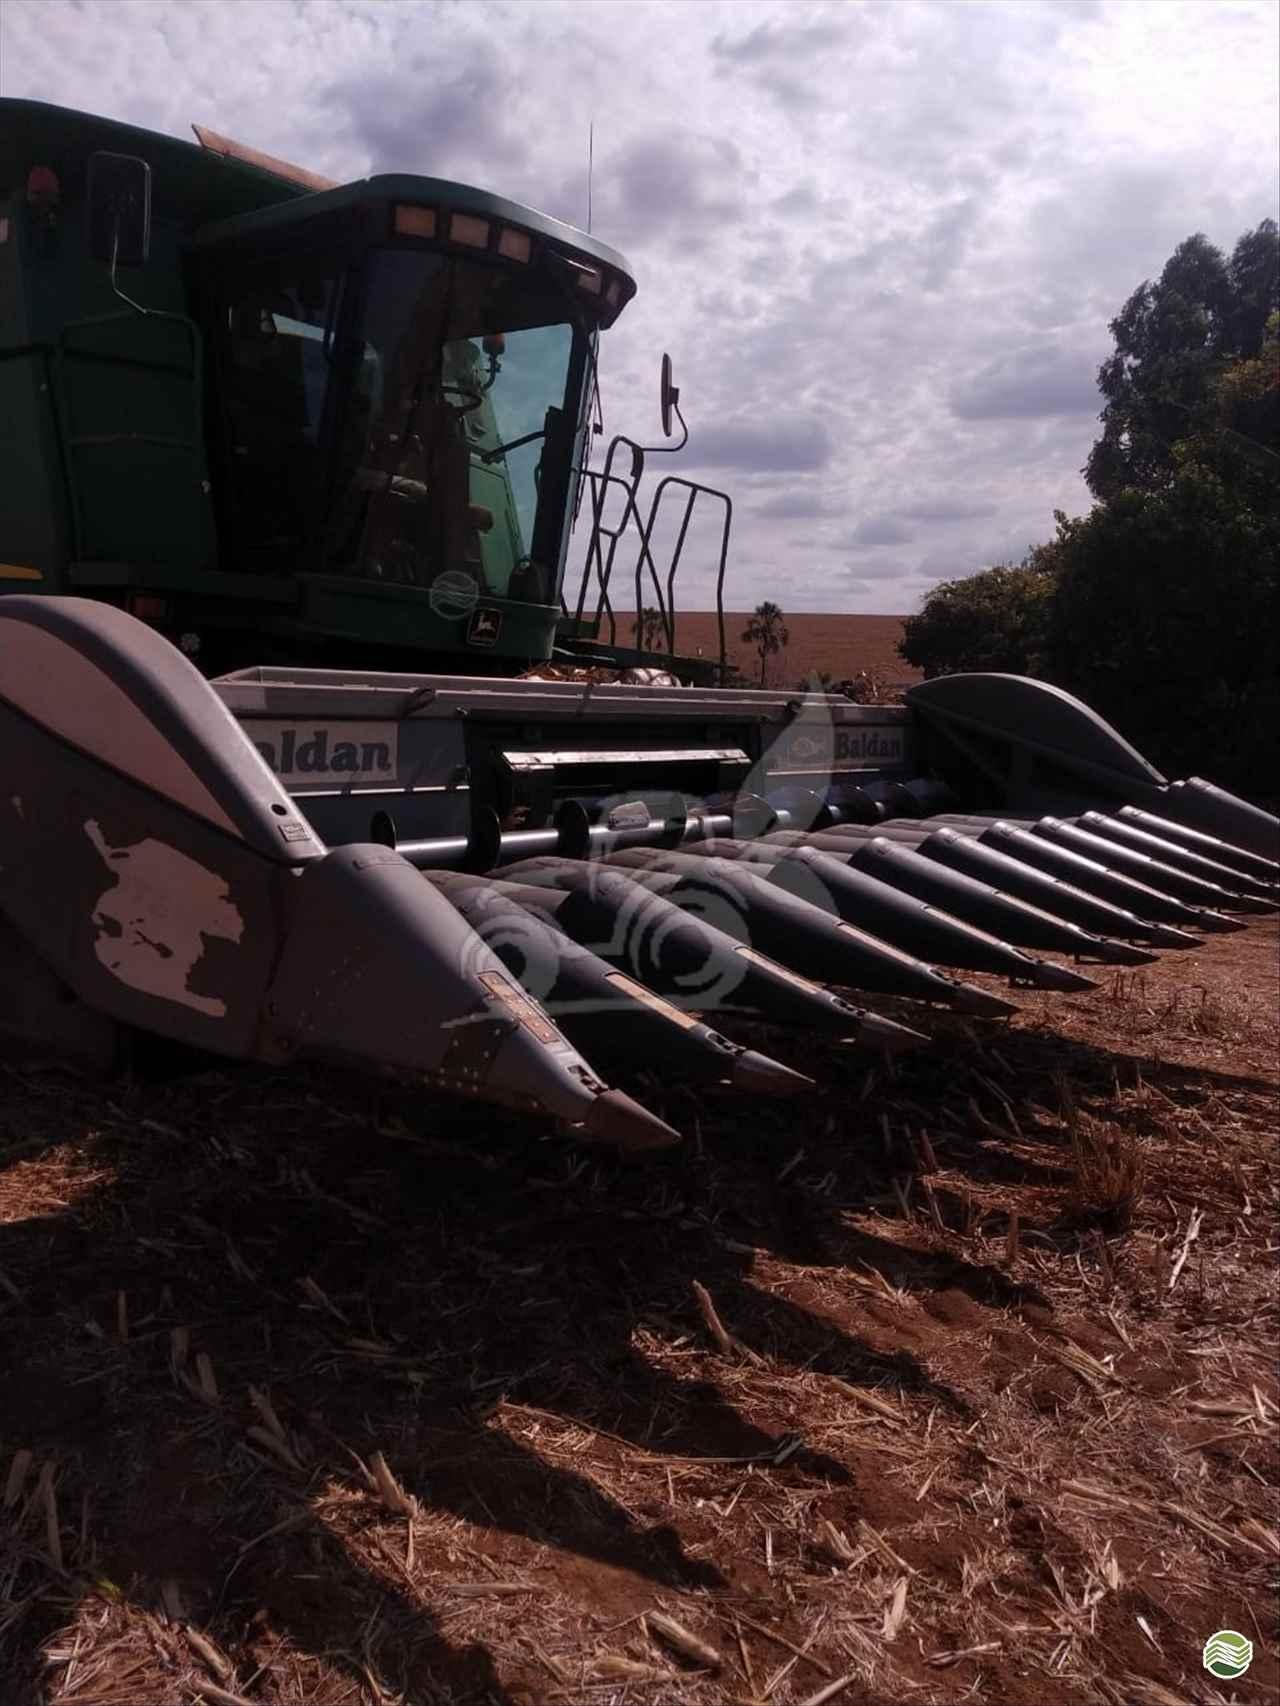 PLATAFORMA COLHEITADEIRA BALDAN POTENZA 1150 EP Máquinas e Implementos Agrícolas CRISTALINA GOIAS GO